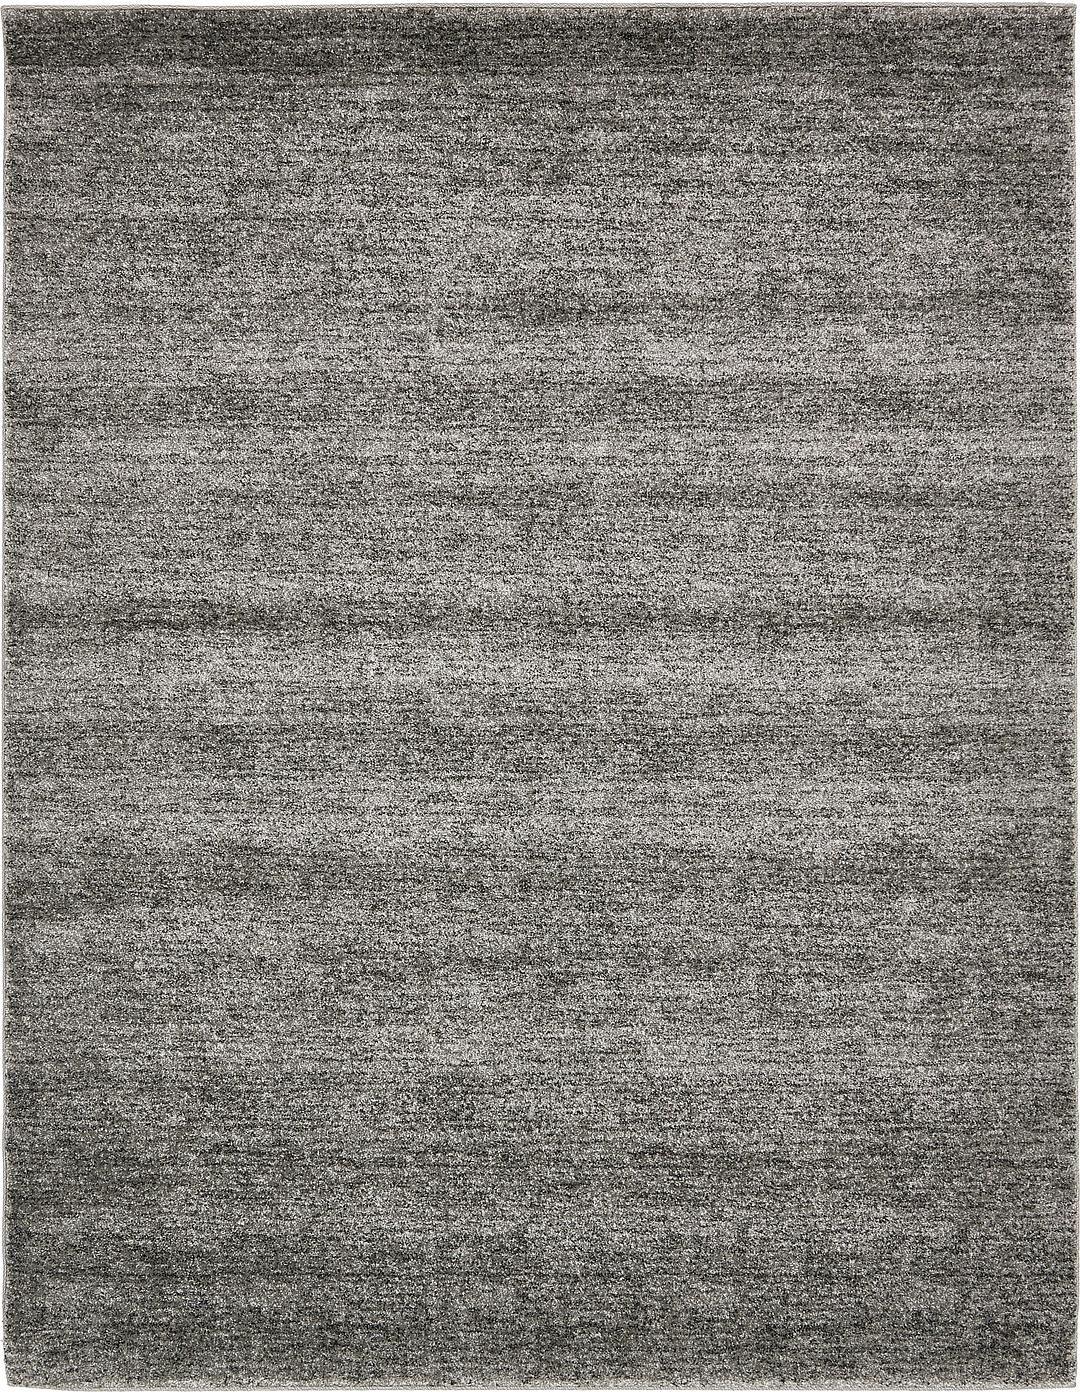 Dark Gray 8 X 10 Solitaire Frieze Rug Area Rugs Erugs